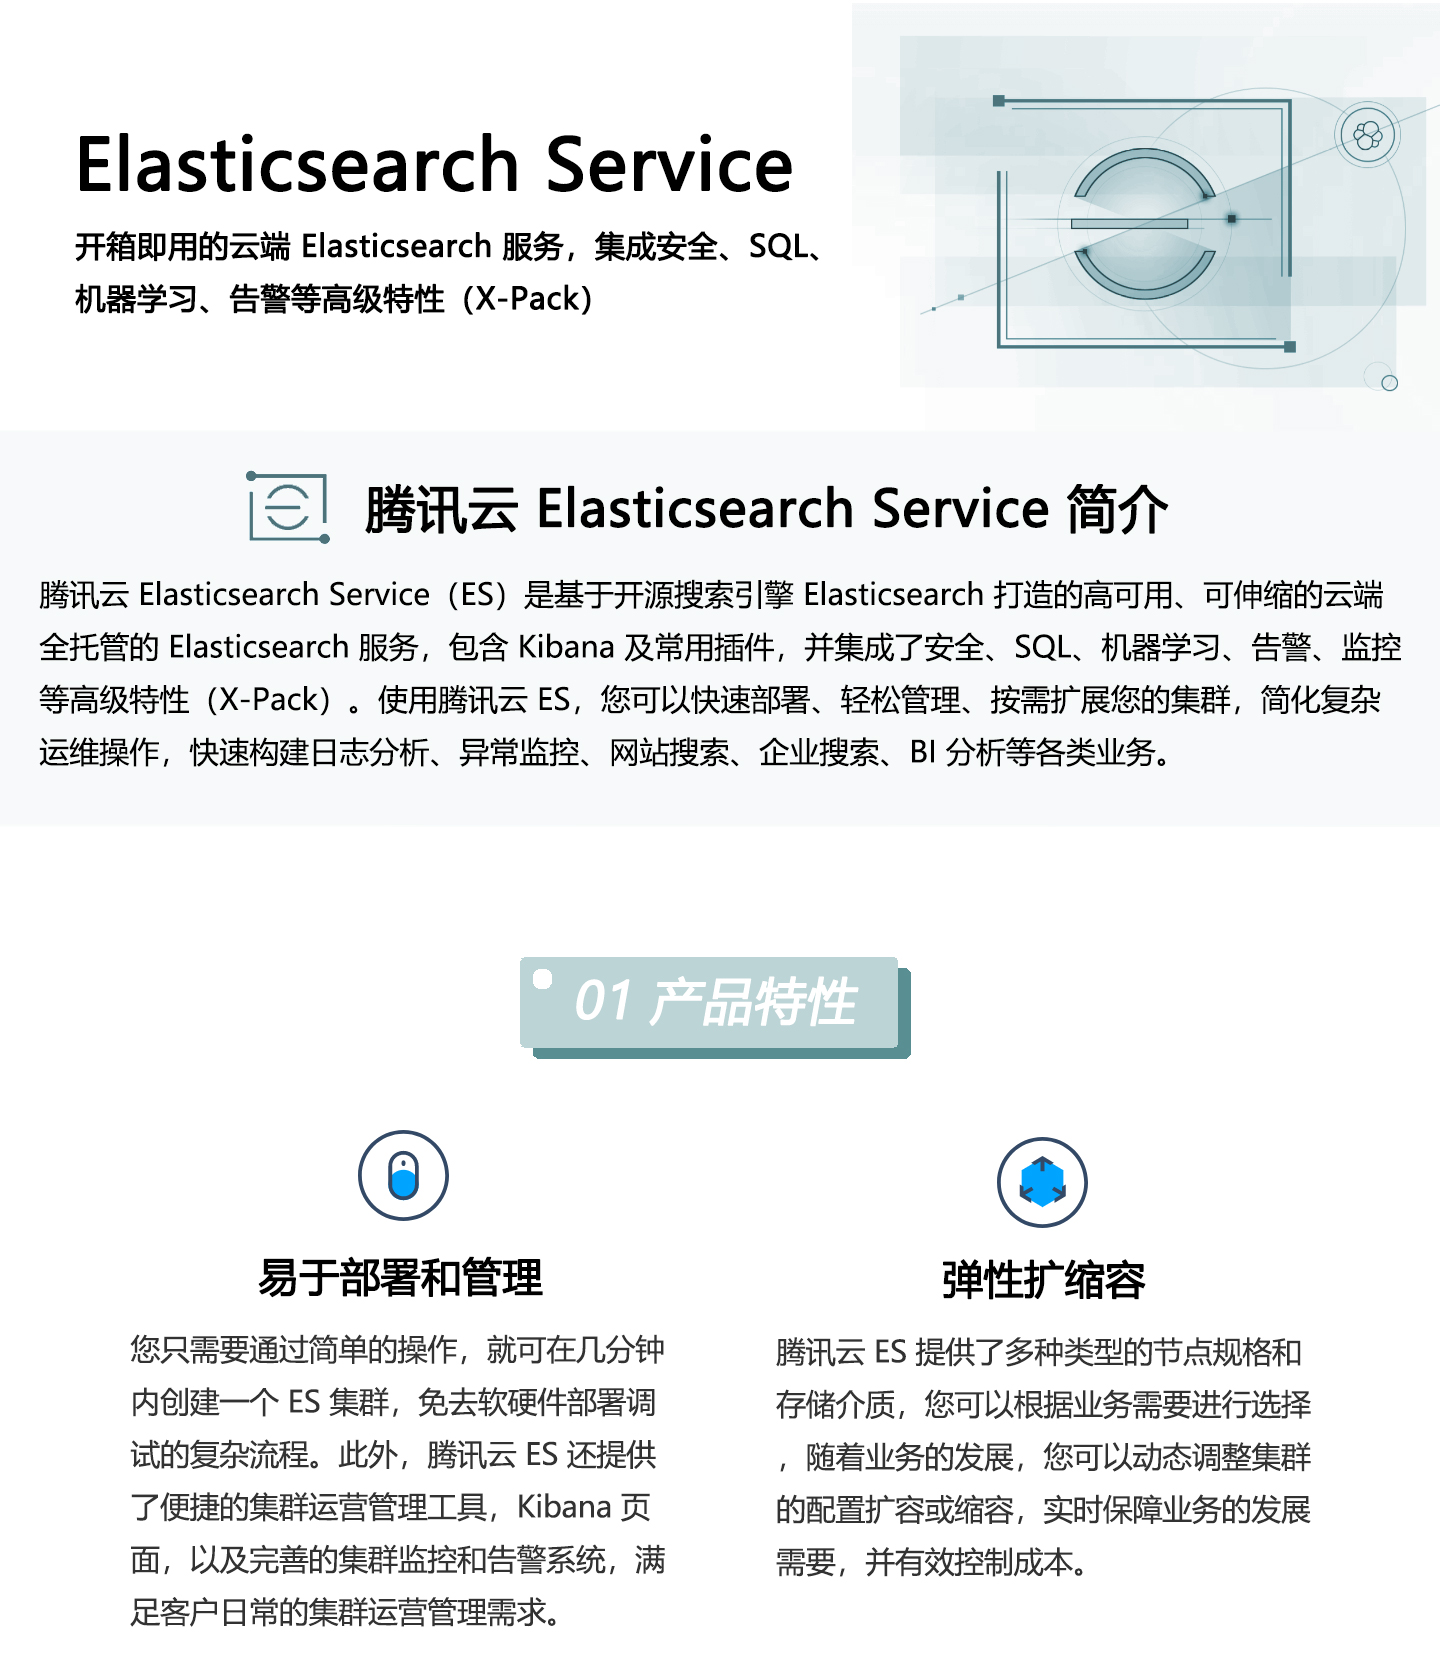 Elasticsearch-Service-1440_01.jpg